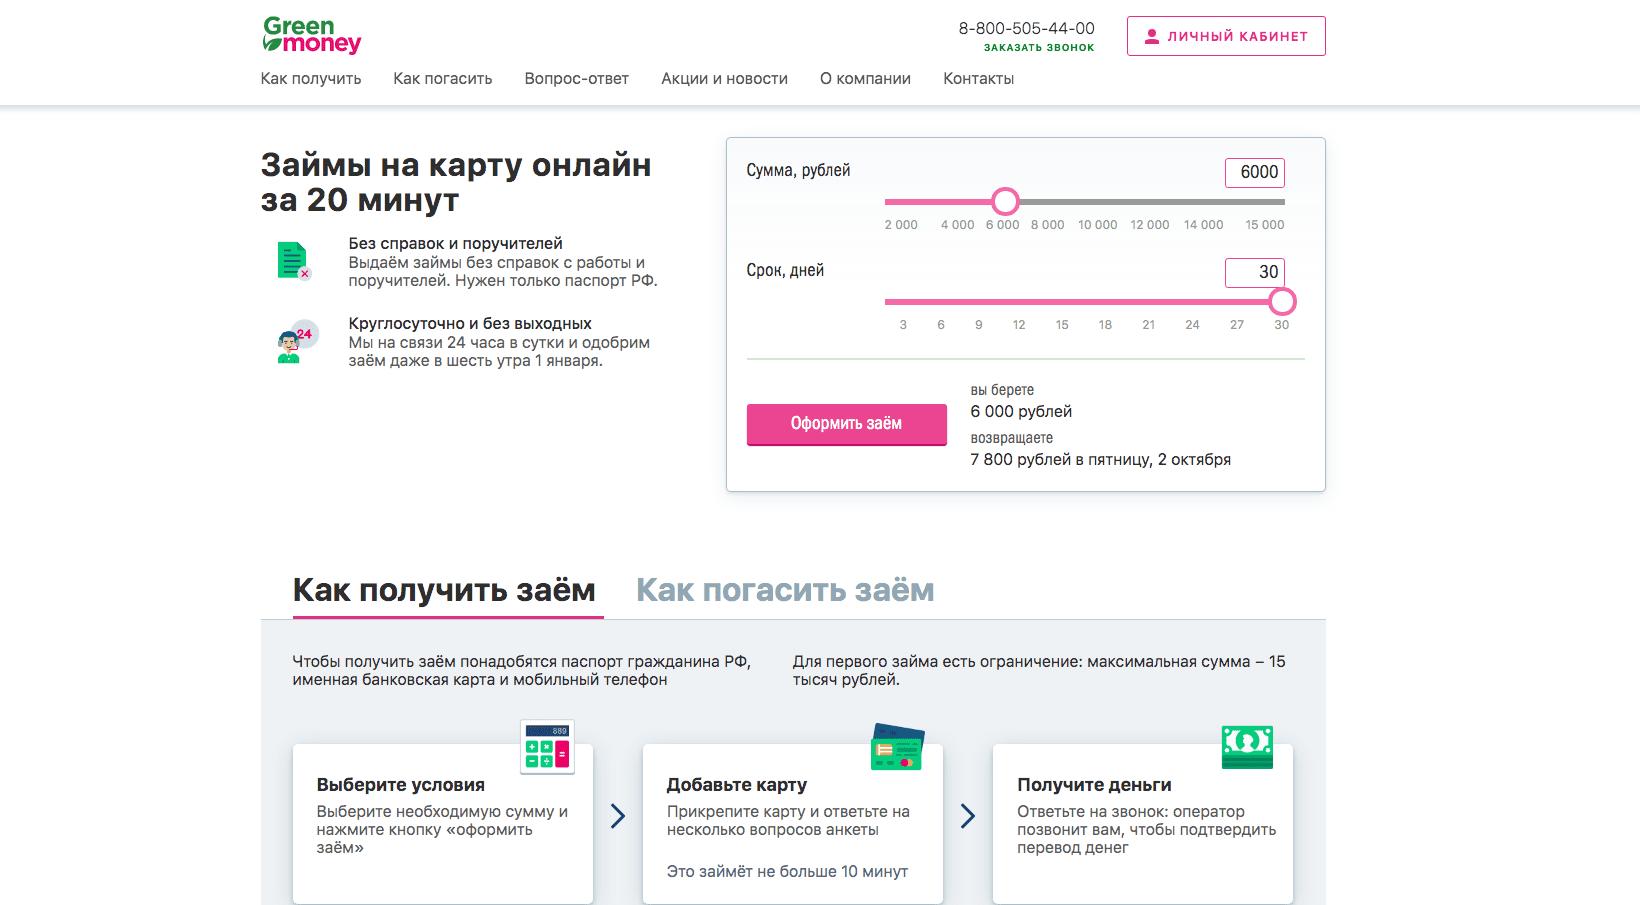 сайт greenmoney